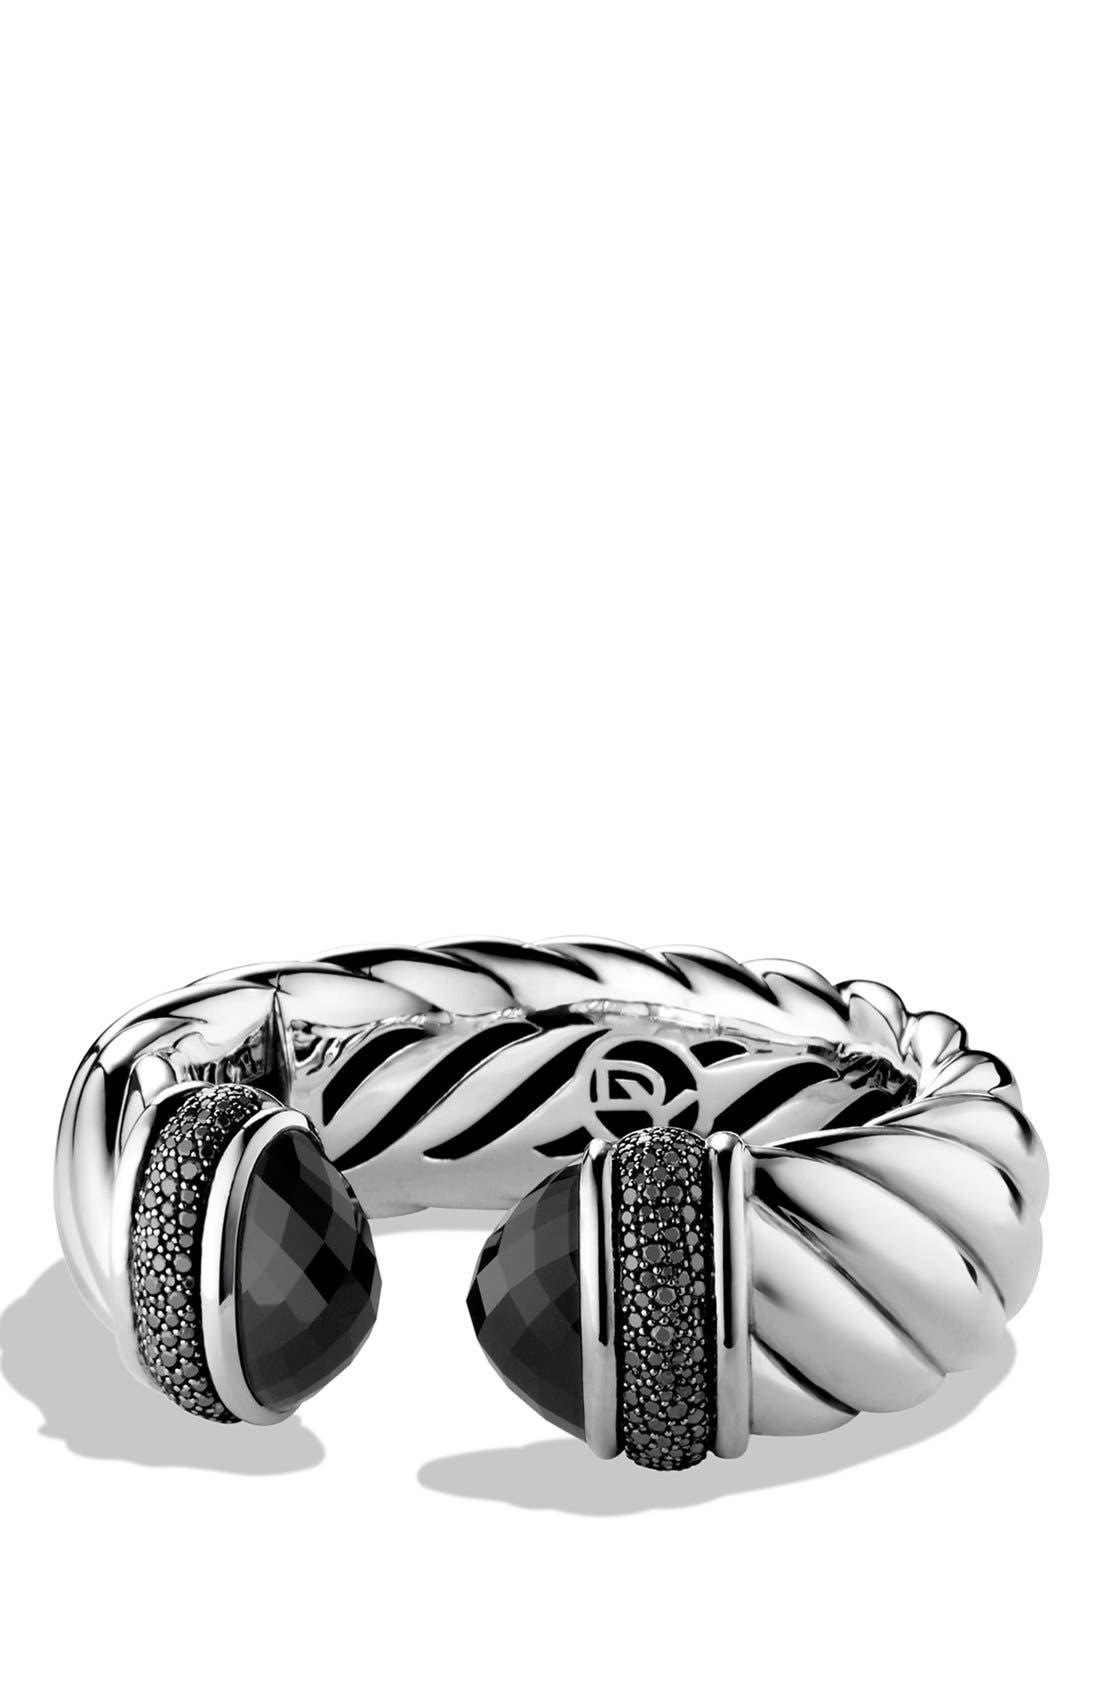 Alternate Image 1 Selected - David Yurman 'Waverly' Bracelet